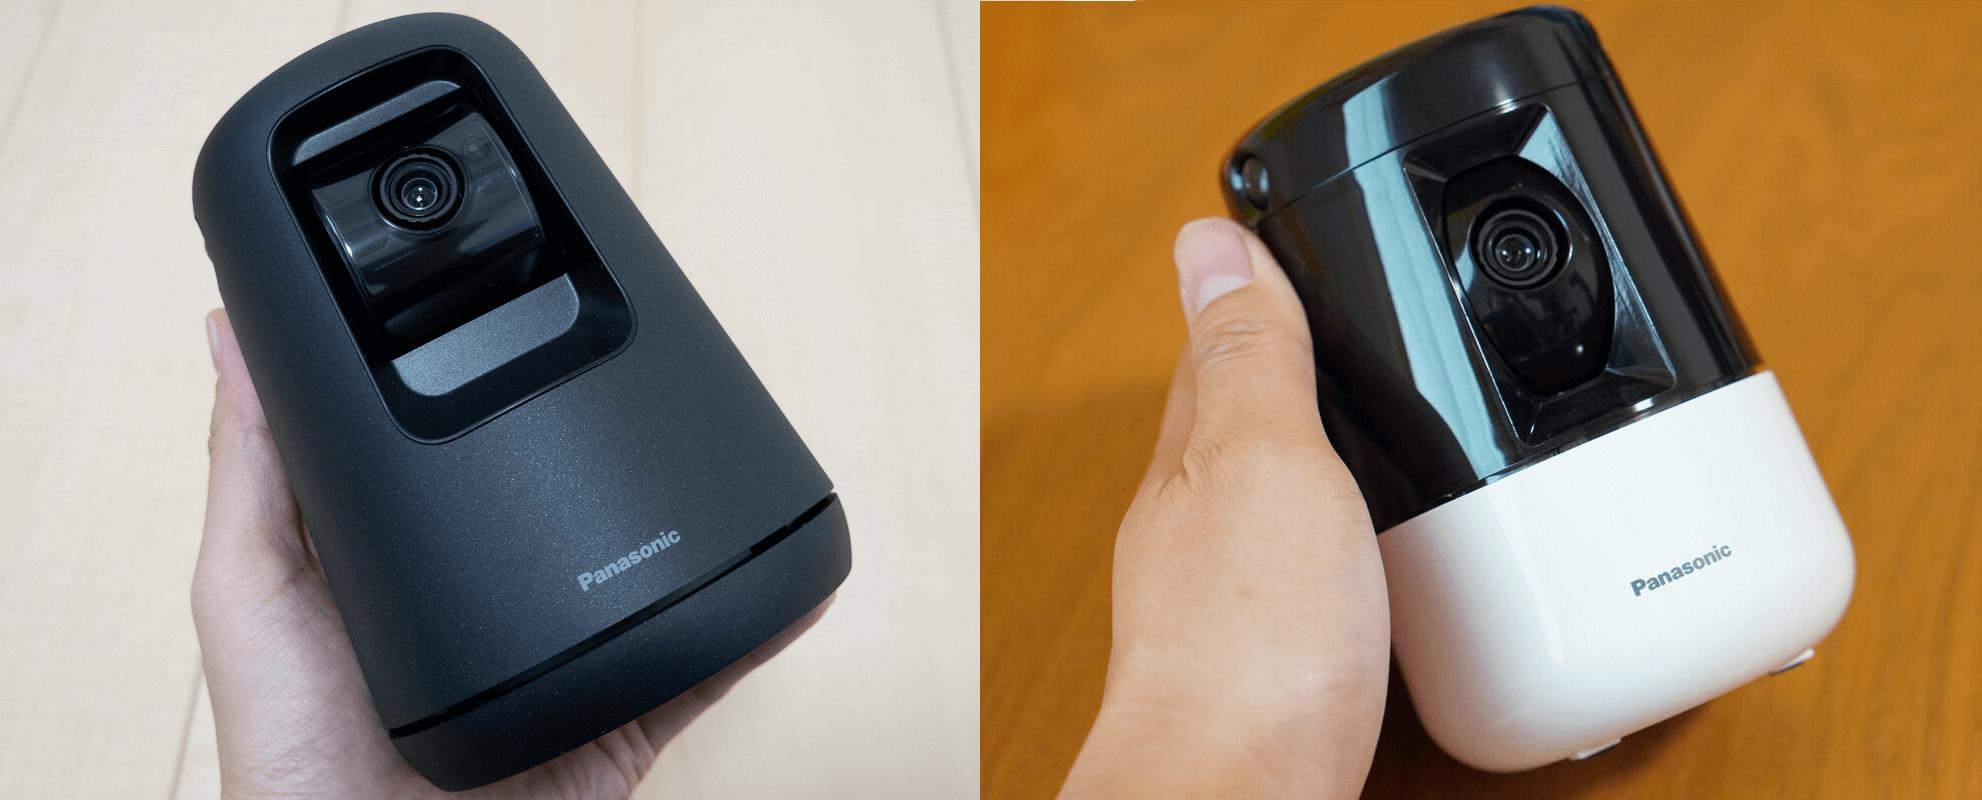 Panasonicペットカメラ「KX-HDN215」と「KX-HDN205」の違い